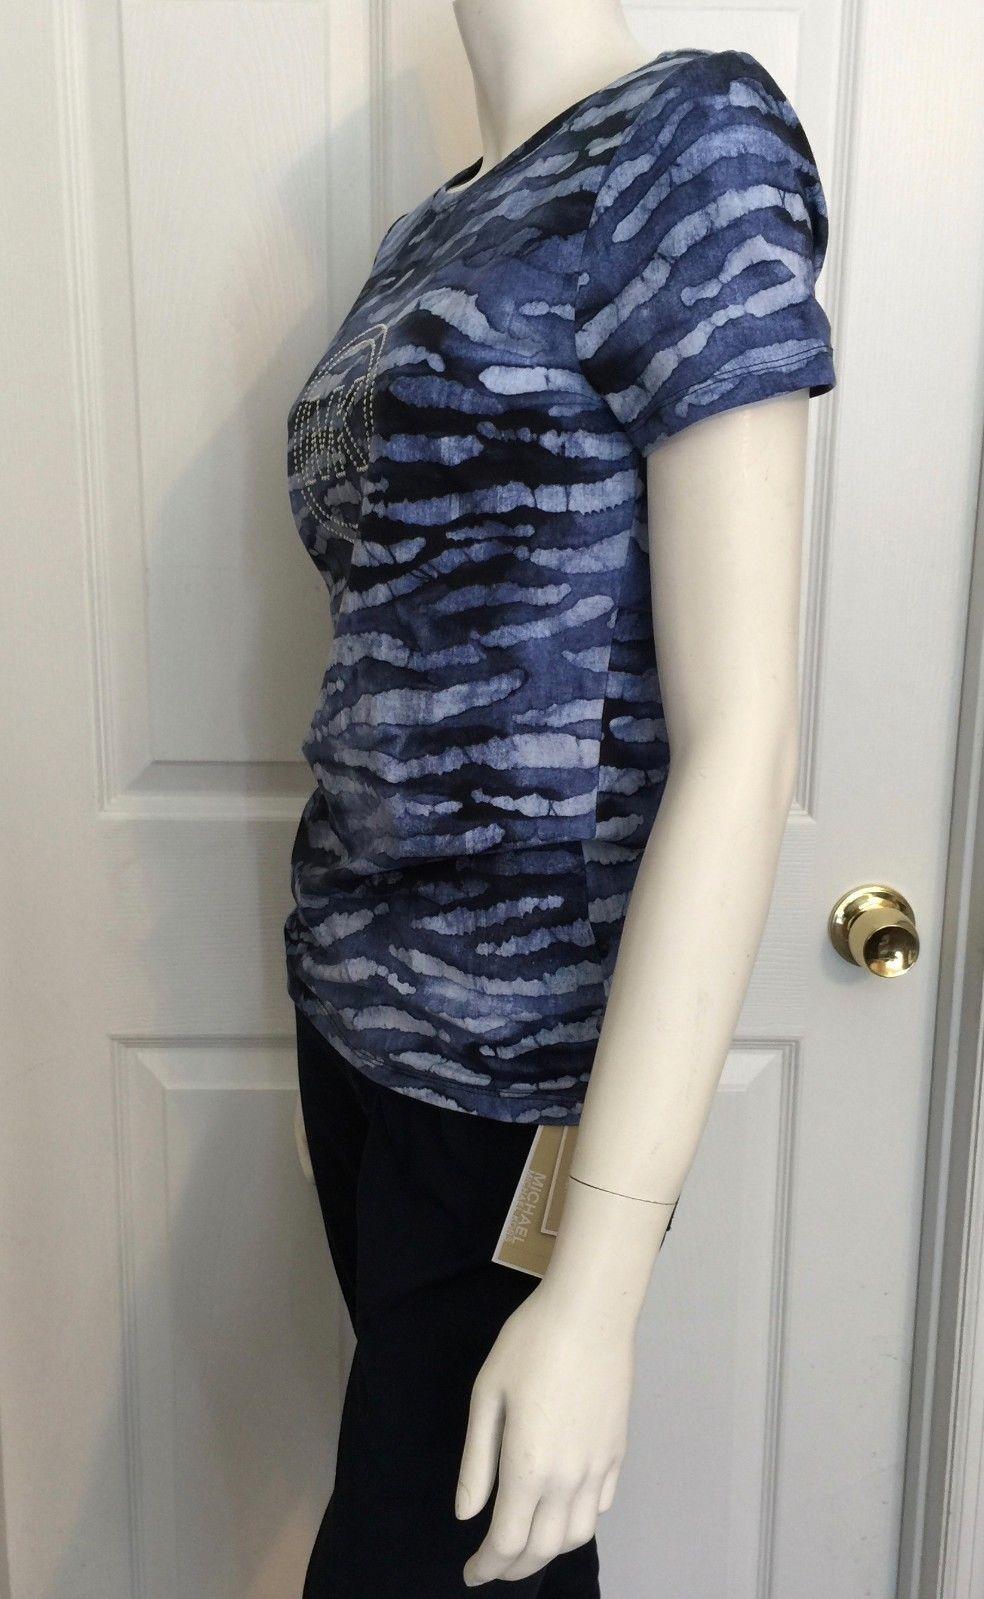 New Michael Kors Silver Studs Logo Crew Neck T-shirt Casual Top Indigo Blue $59